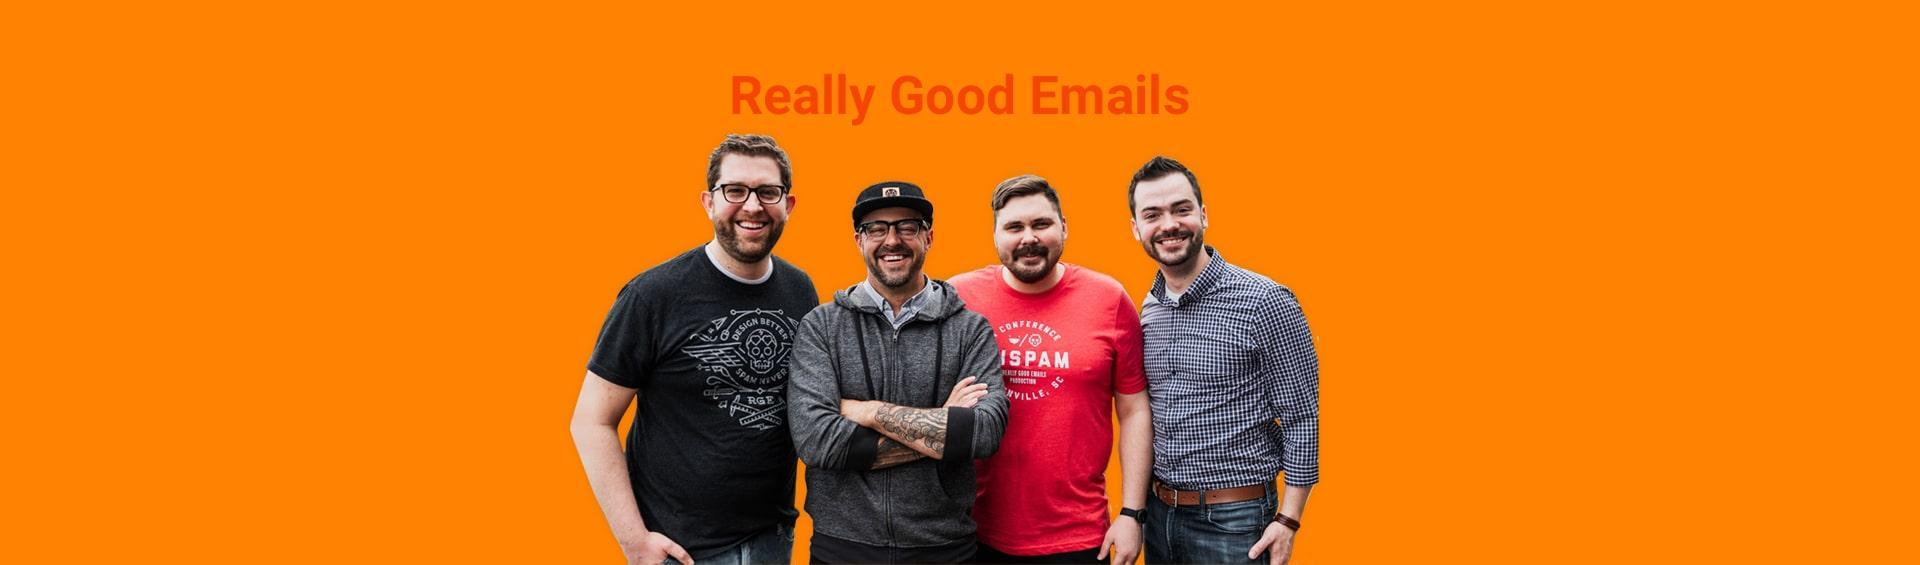 Really Good Emails отрендах вдизайне иemail-маркетинге снунчаками